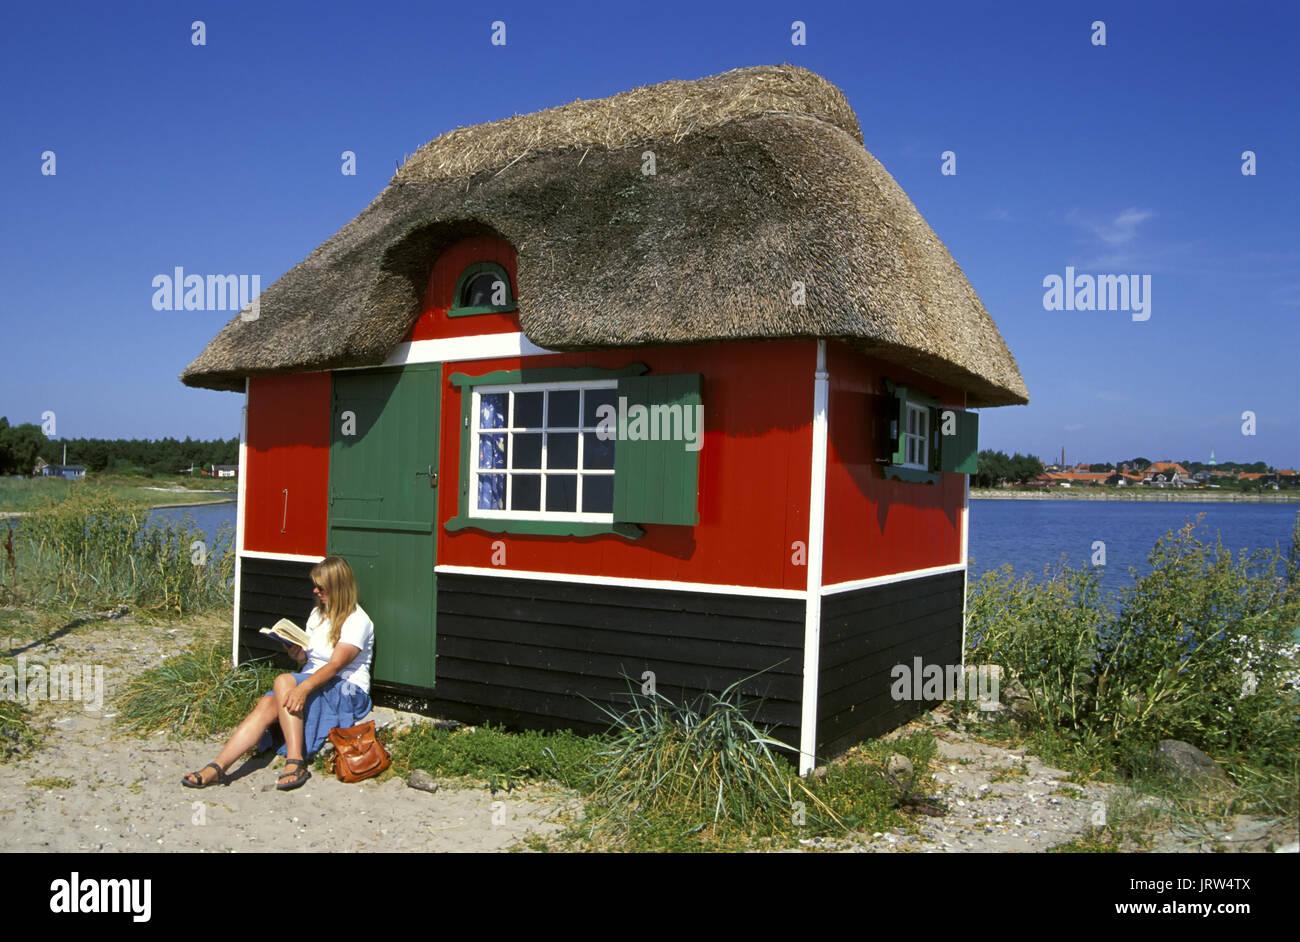 Bathing house at Marstal beach, Aeroe island, Fyn, Denmark, Scandinavia, Europe - Stock Image